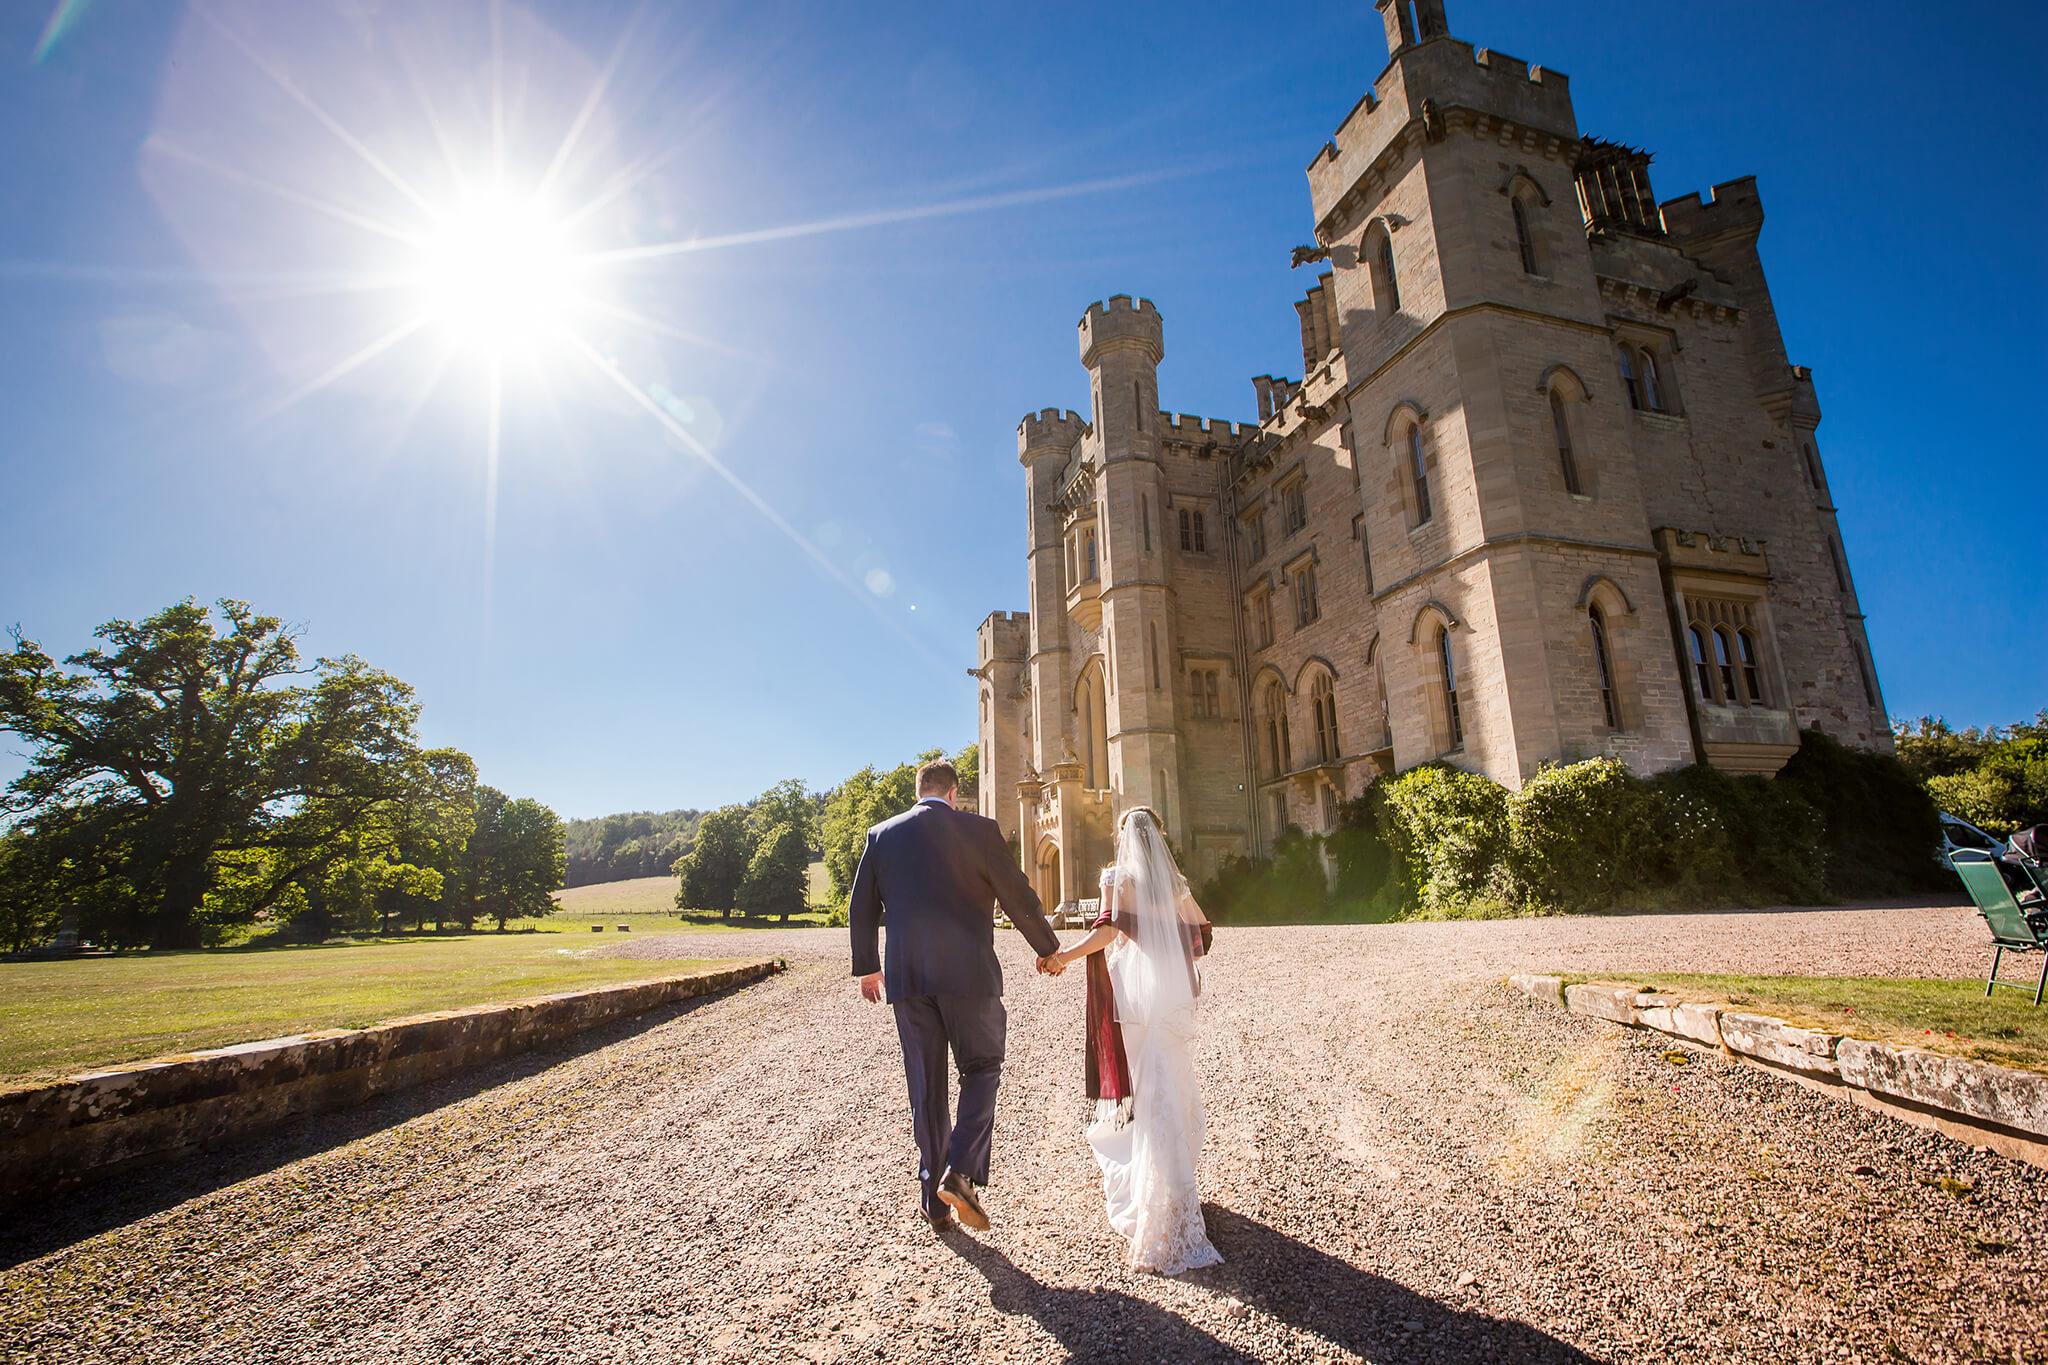 duns-castle-scotland-wedding-photographer copy